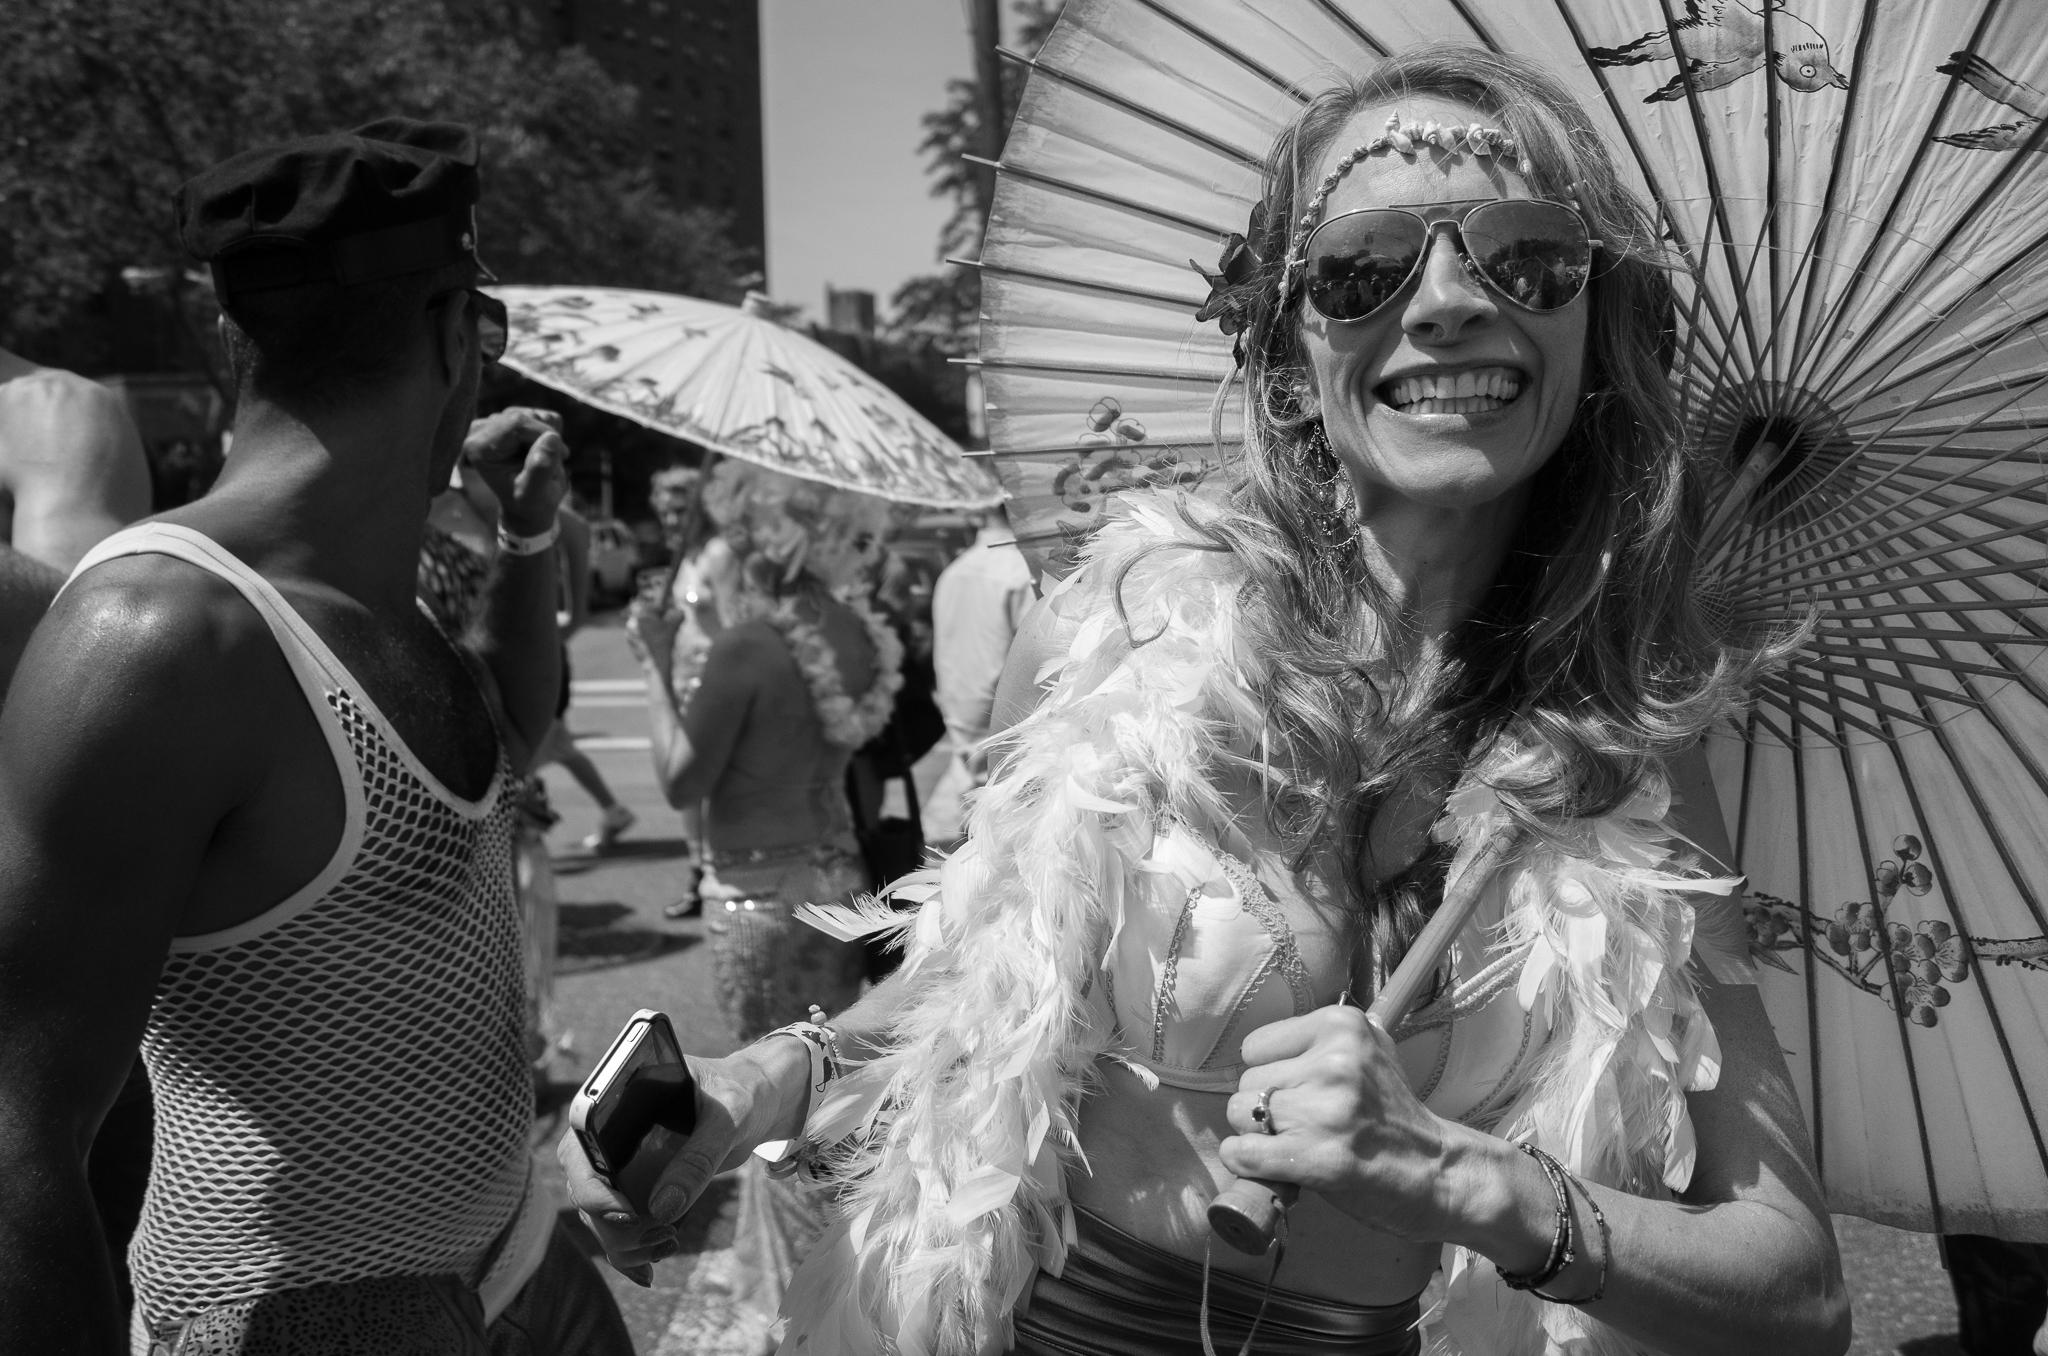 mermaid_parade_2014_013.jpg